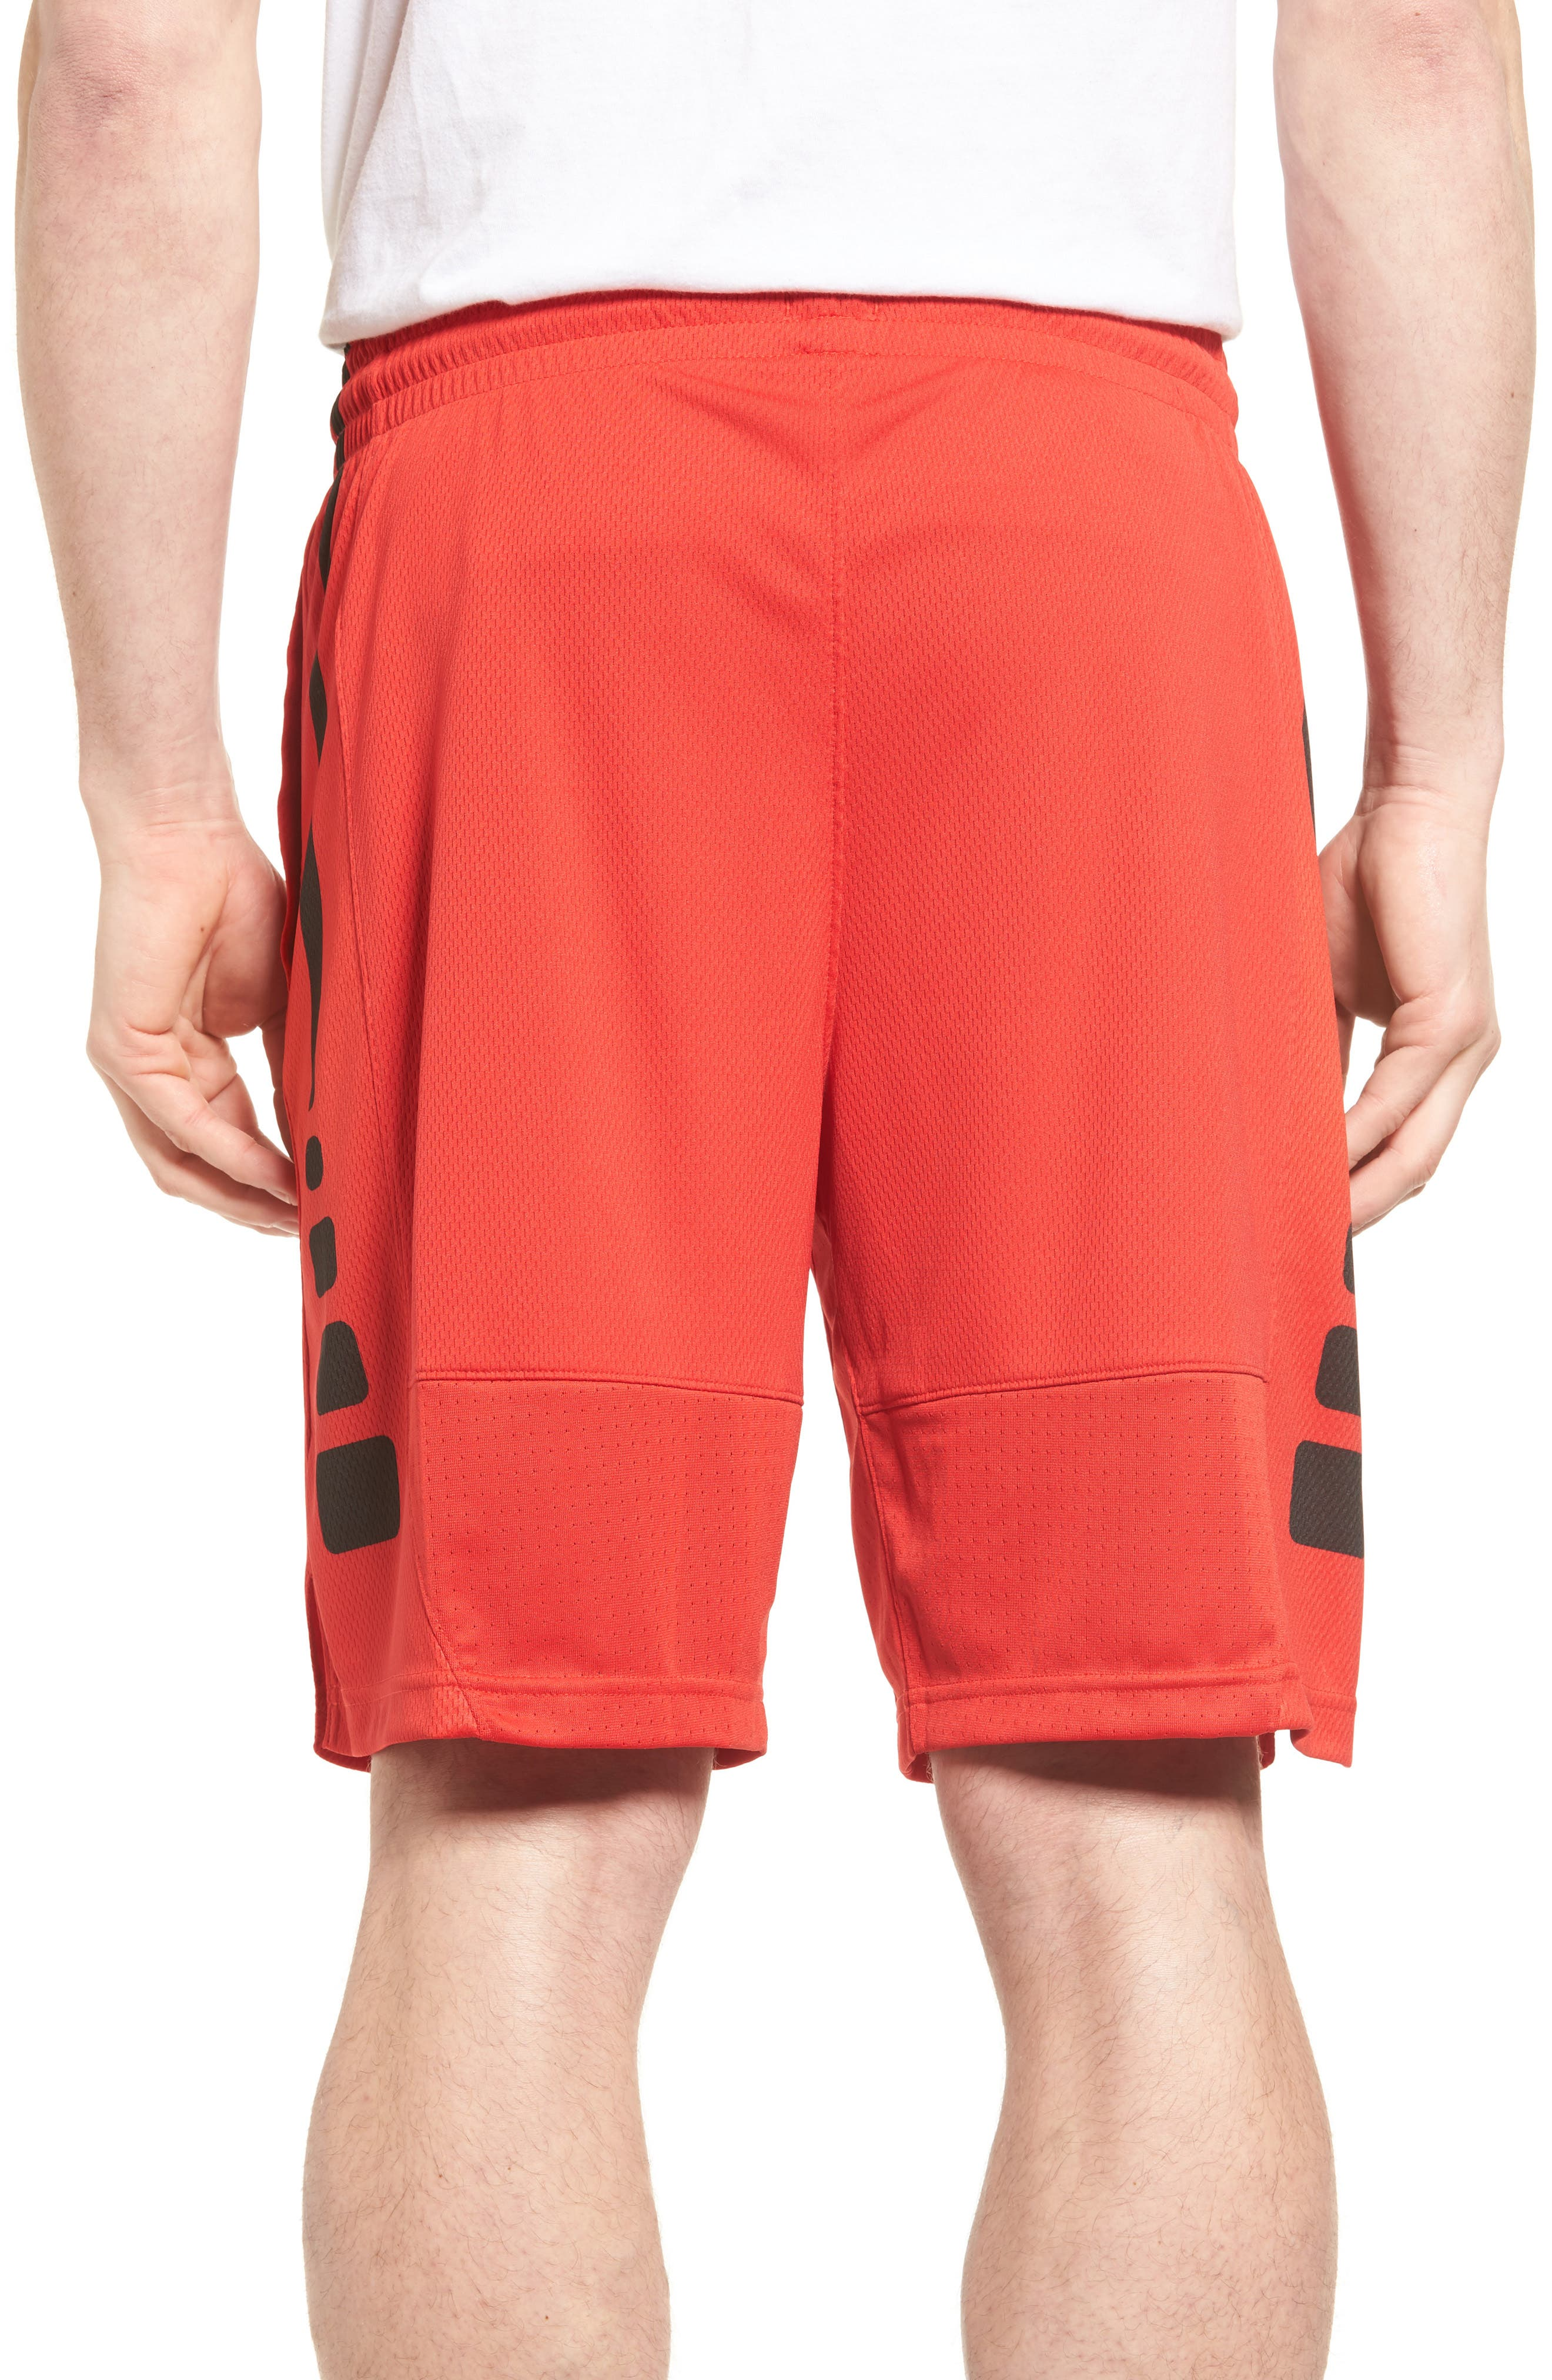 Elite Stripe Basketball Shorts,                             Alternate thumbnail 2, color,                             University Red/ Black